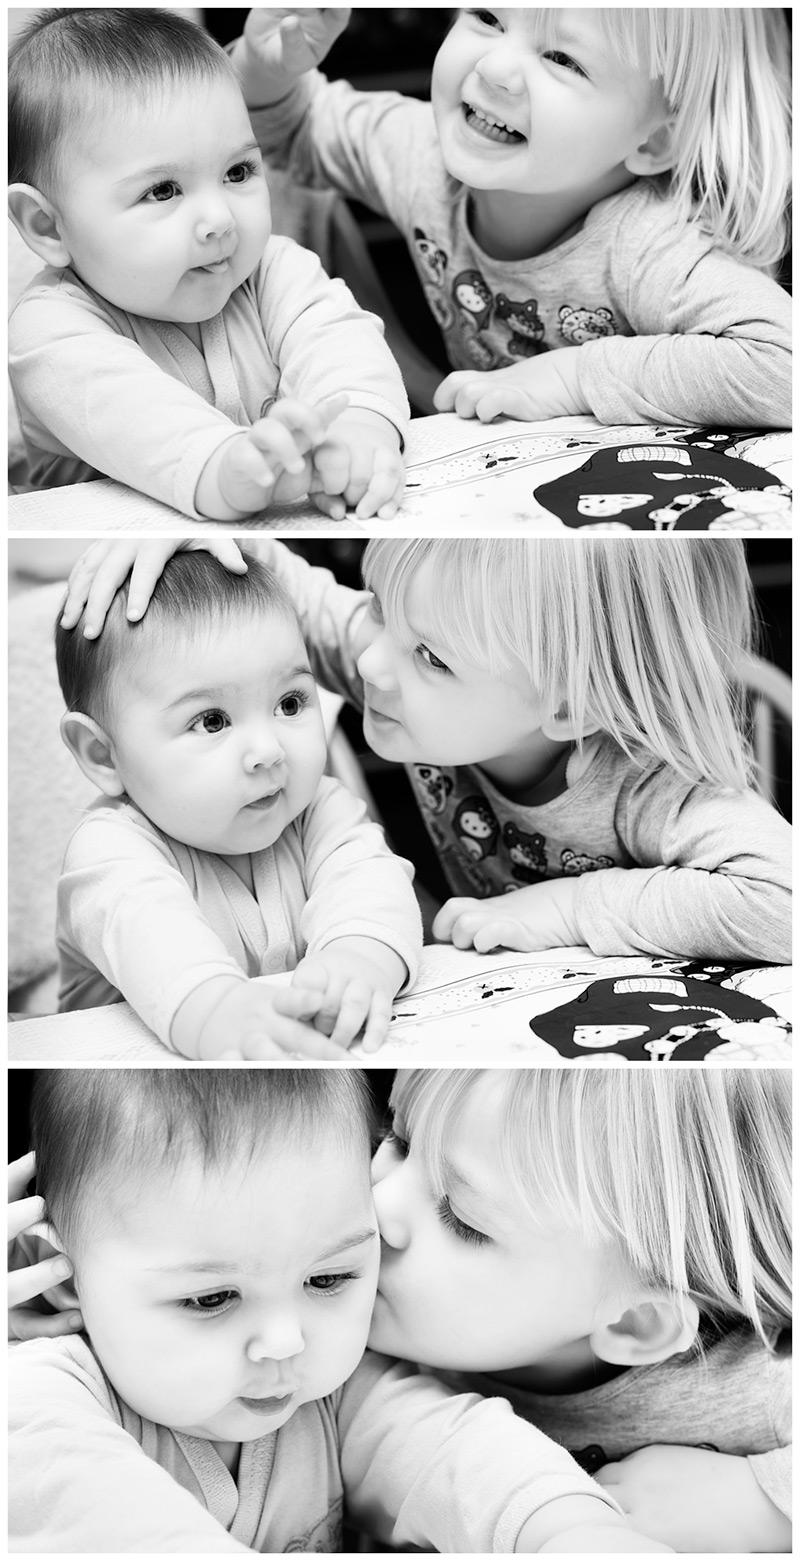 Nadezhda and Tiggy / 3x2 + camera [Sony A99] + children [portraits] + no print + show the original